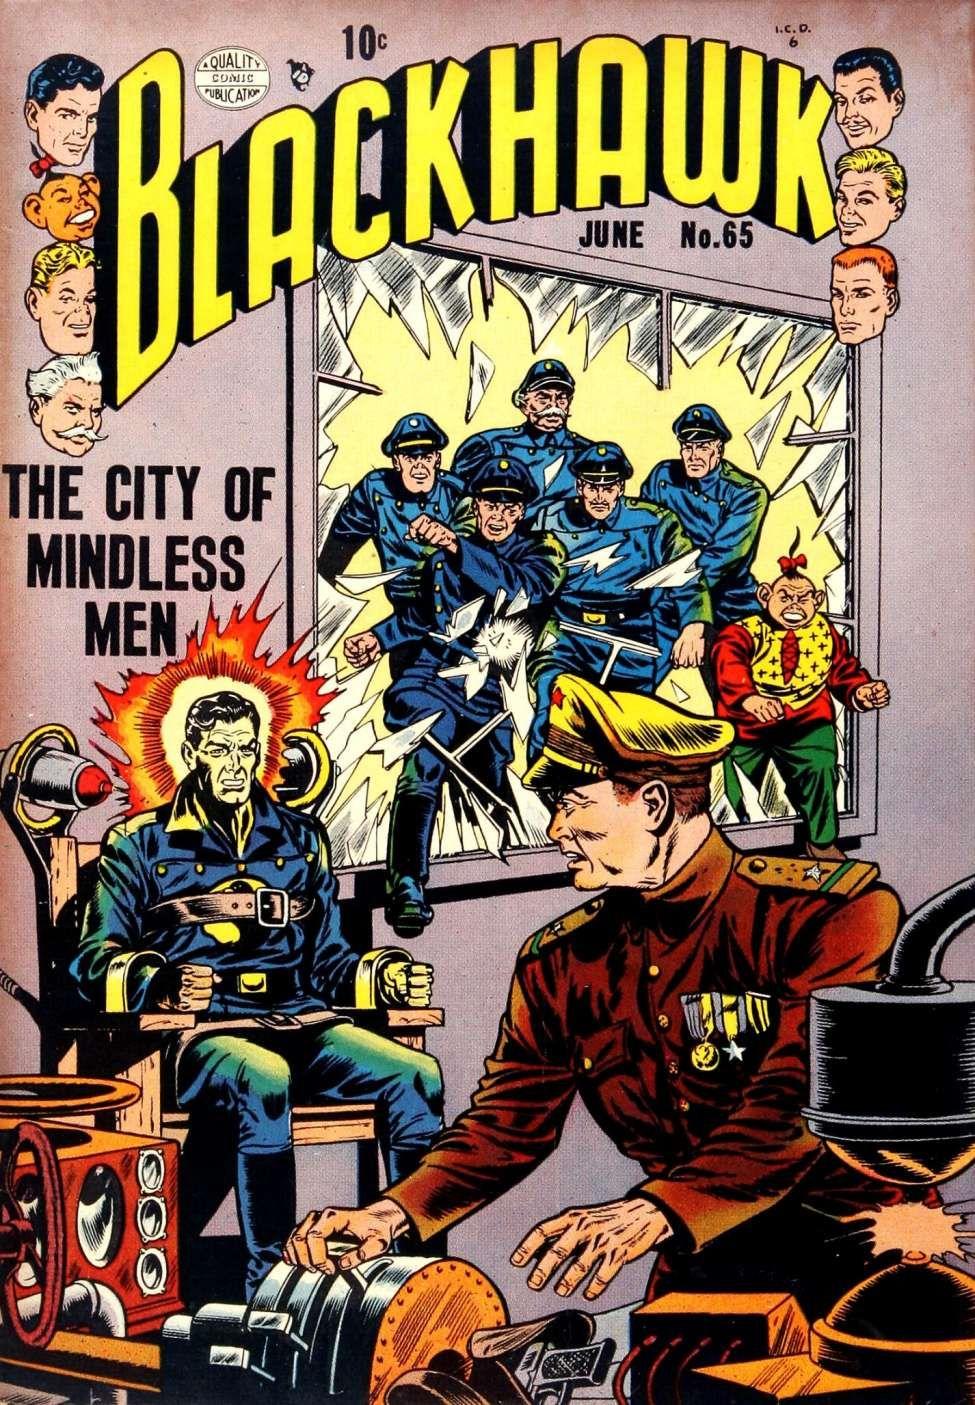 black hawk squadron images - Google Search   Silver Age Comics ...